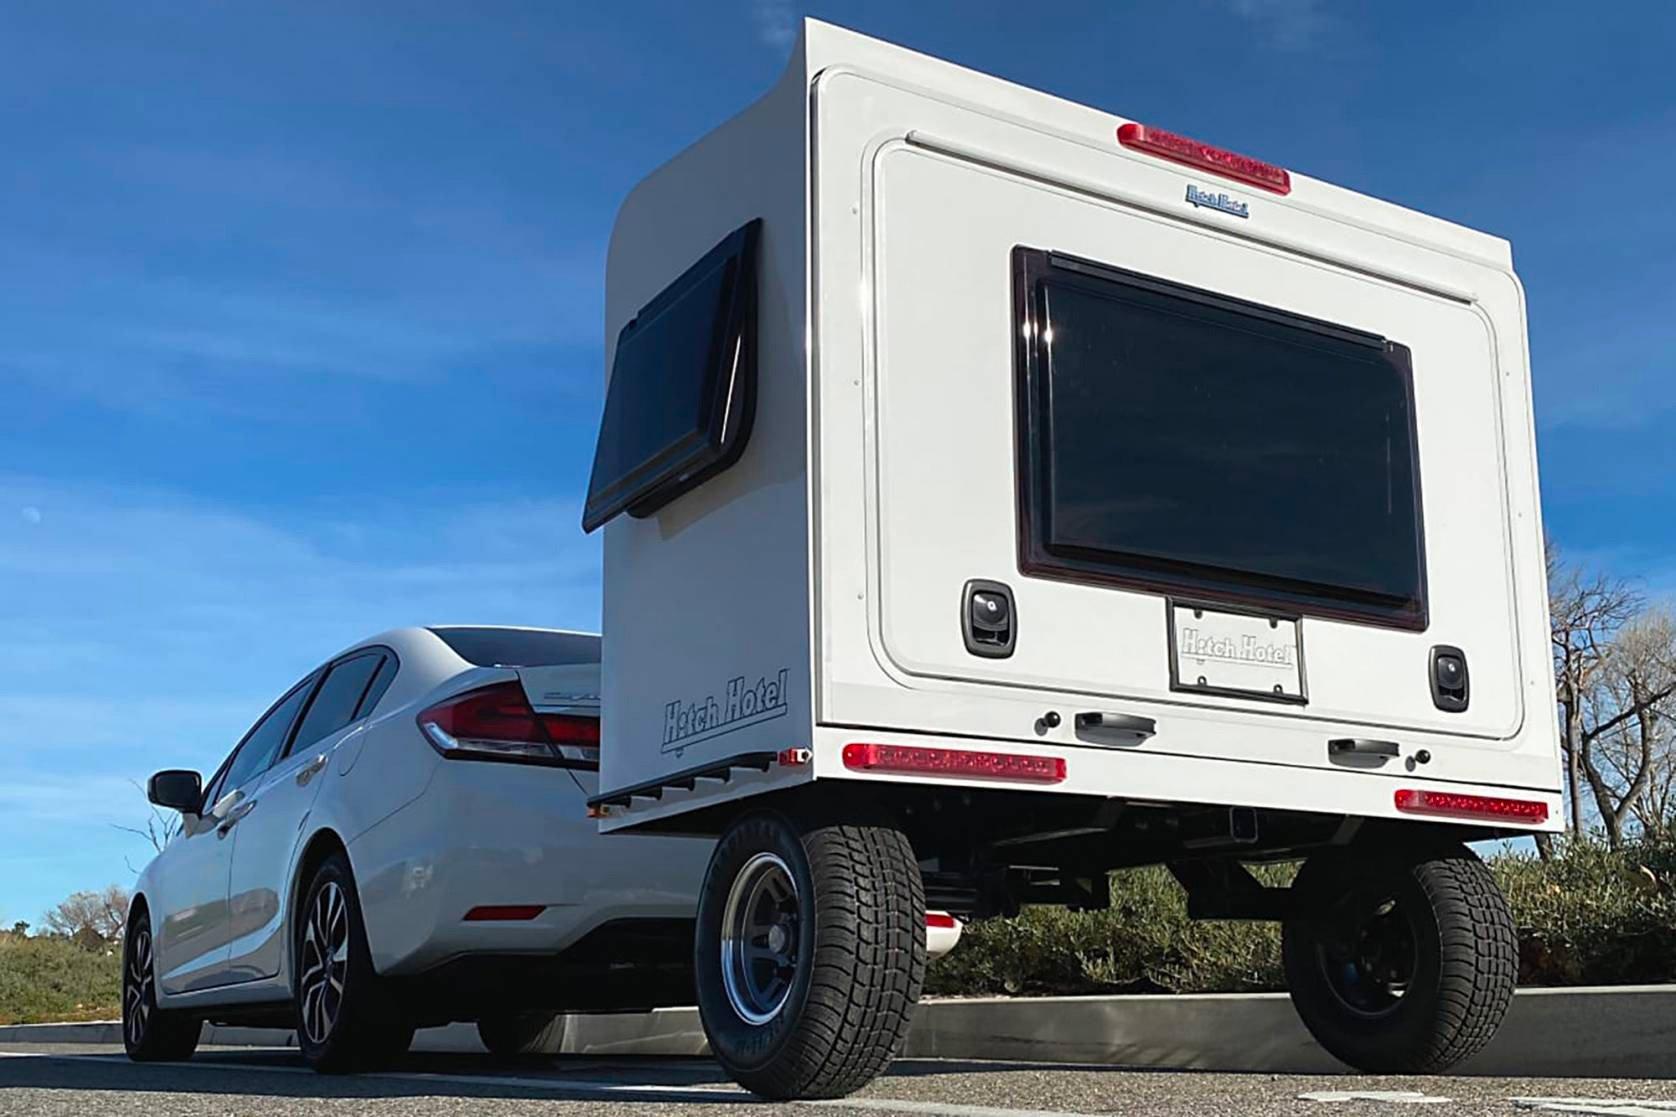 The Hitch Hotel Traveler is a Super Compact Camper at werd.com